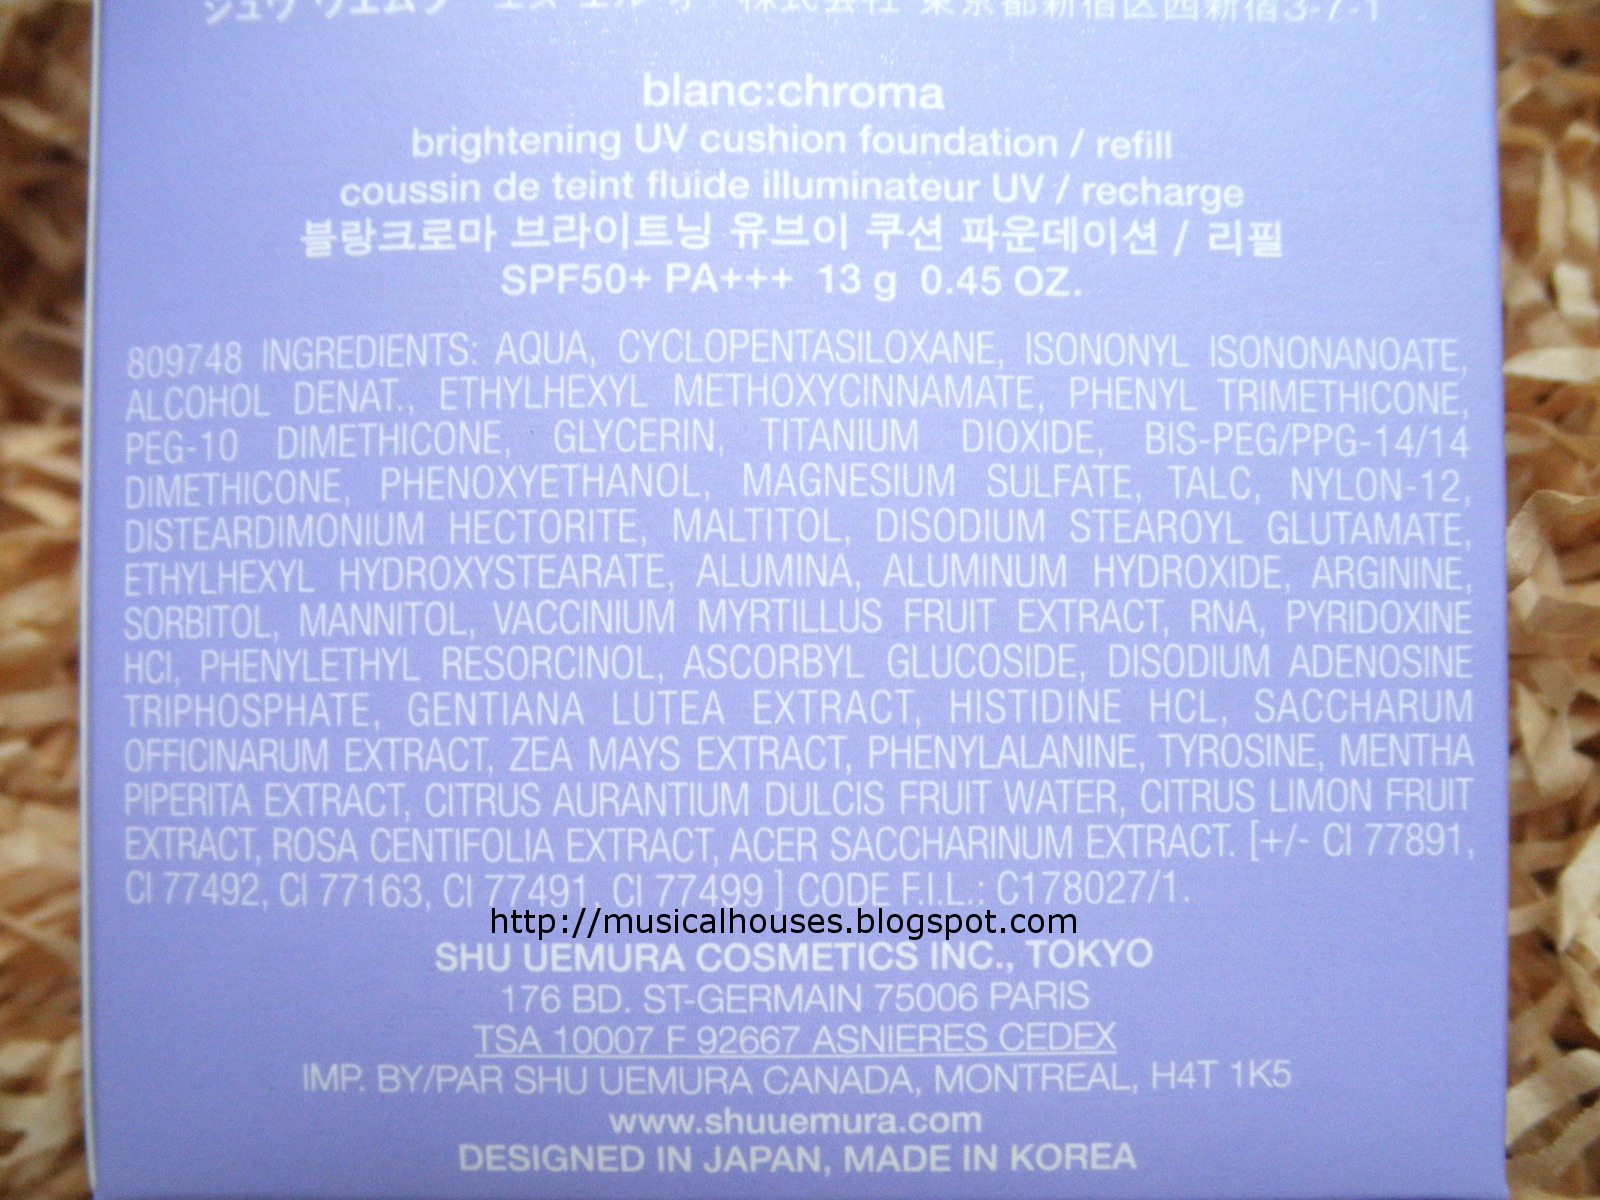 Shu Uemura Blanc Chroma Brightening UV Cushion Ingredients